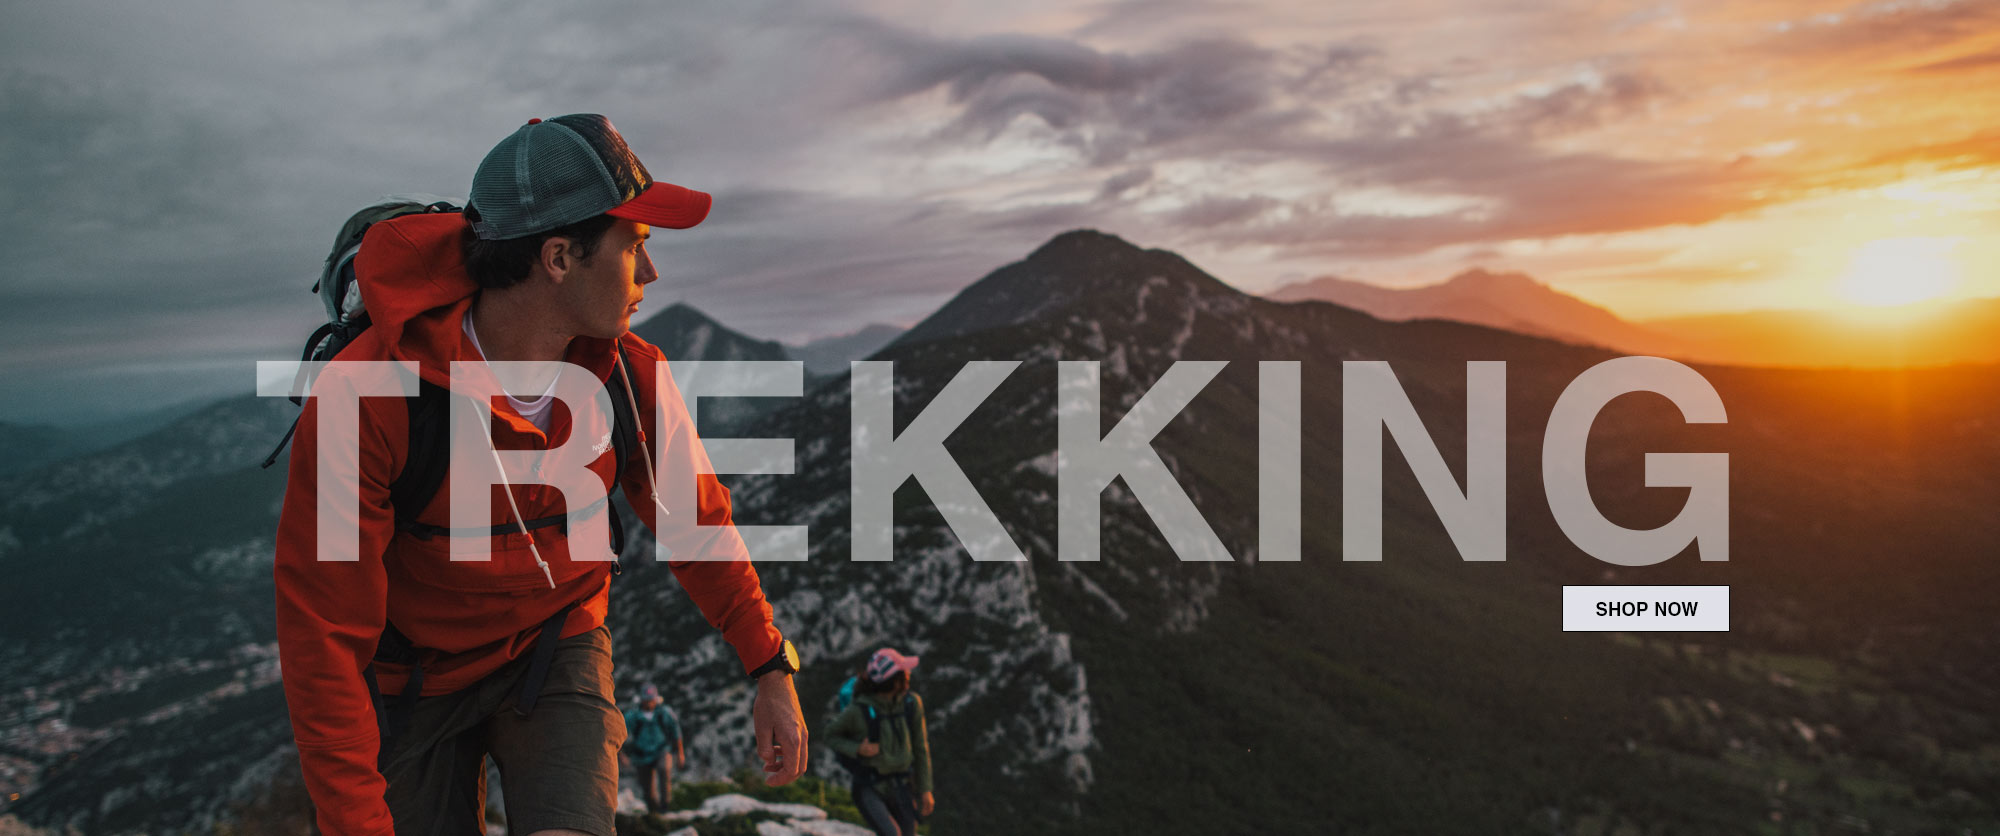 banner-principal-20190520 - Trekking e Hiking